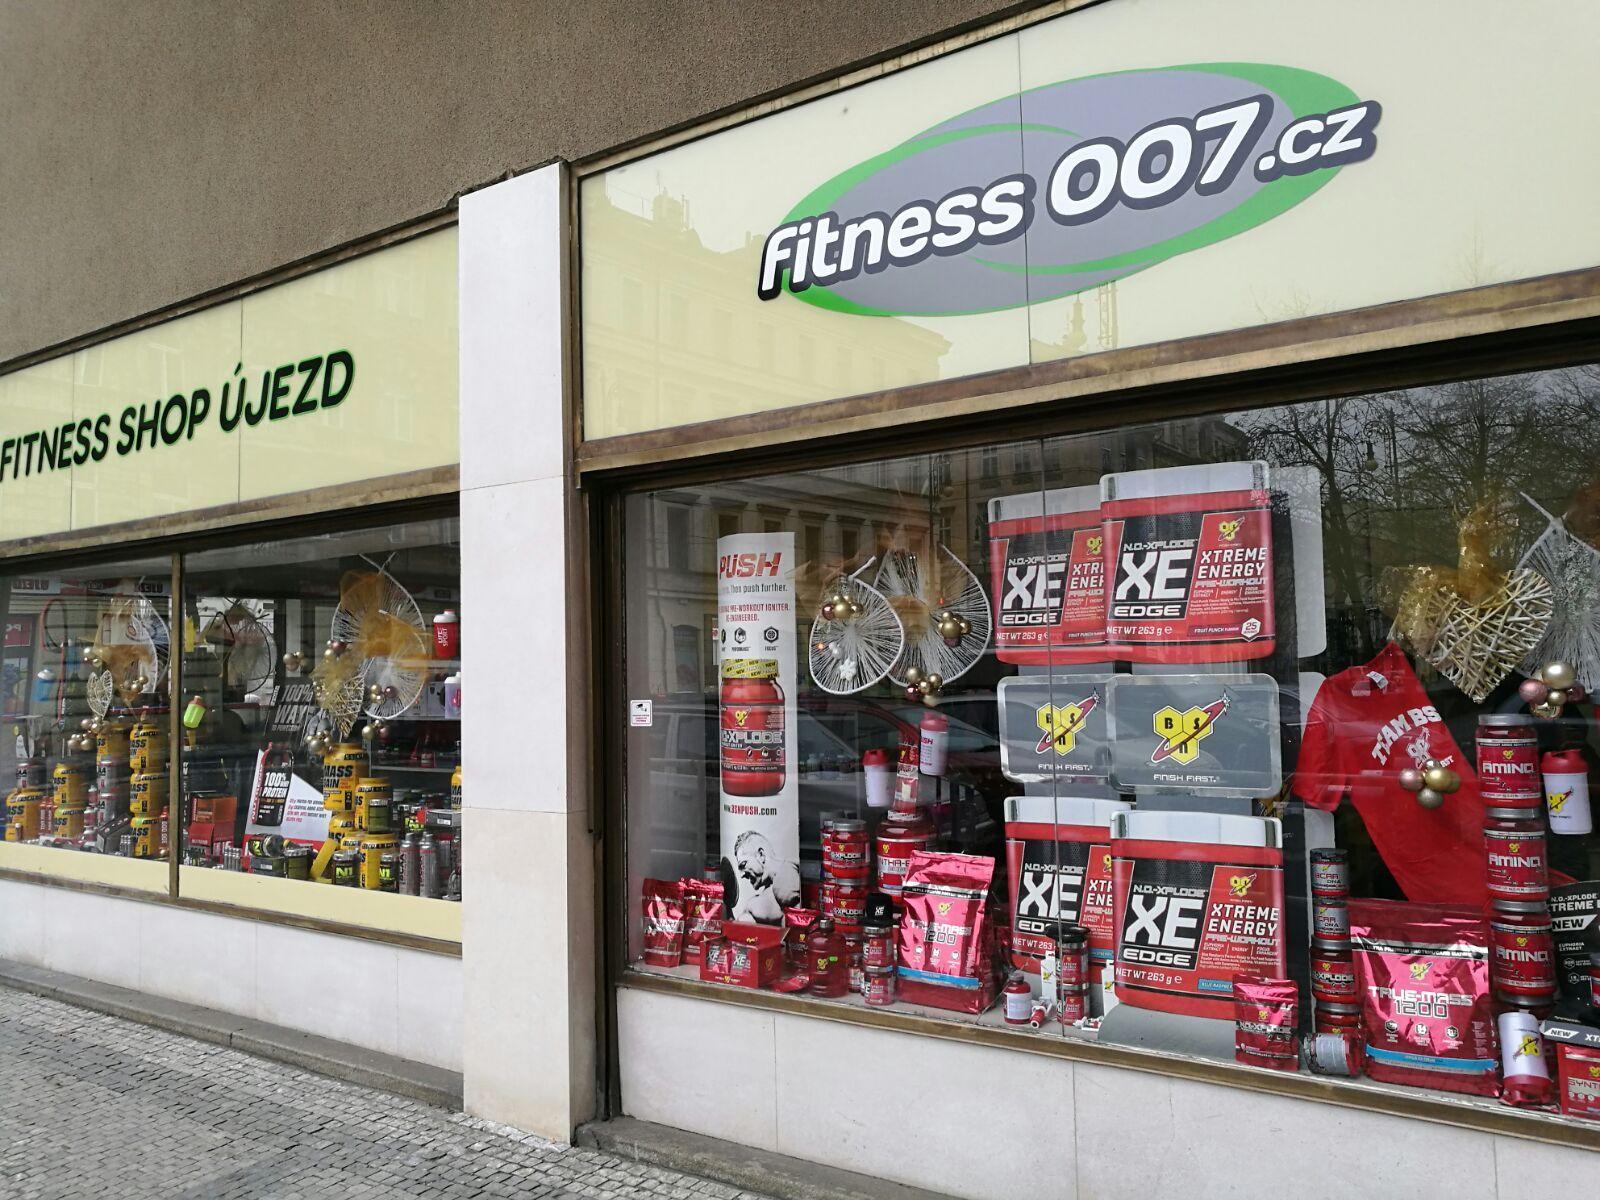 fitness007-fitness-shop-praha-2